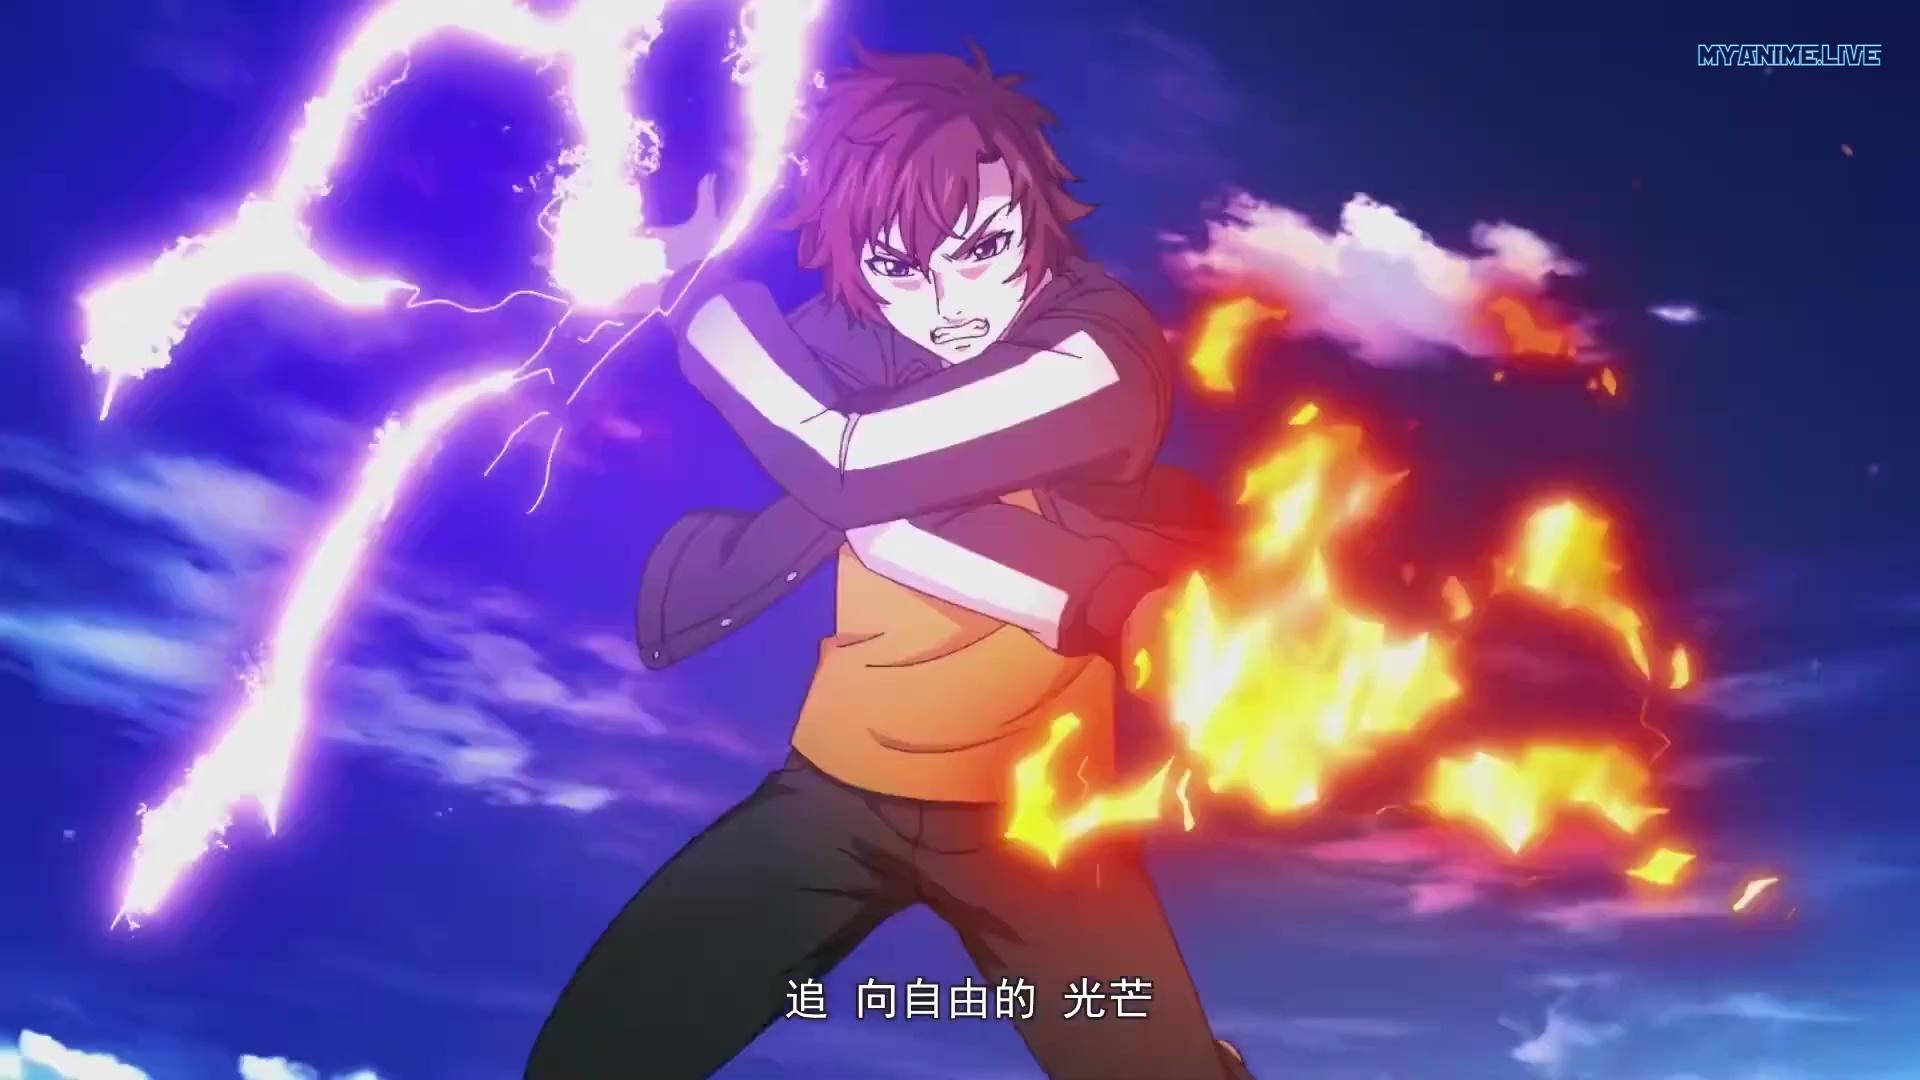 Quanzhi Fashi - Full Time Magister 5th Season episode 01 english sub